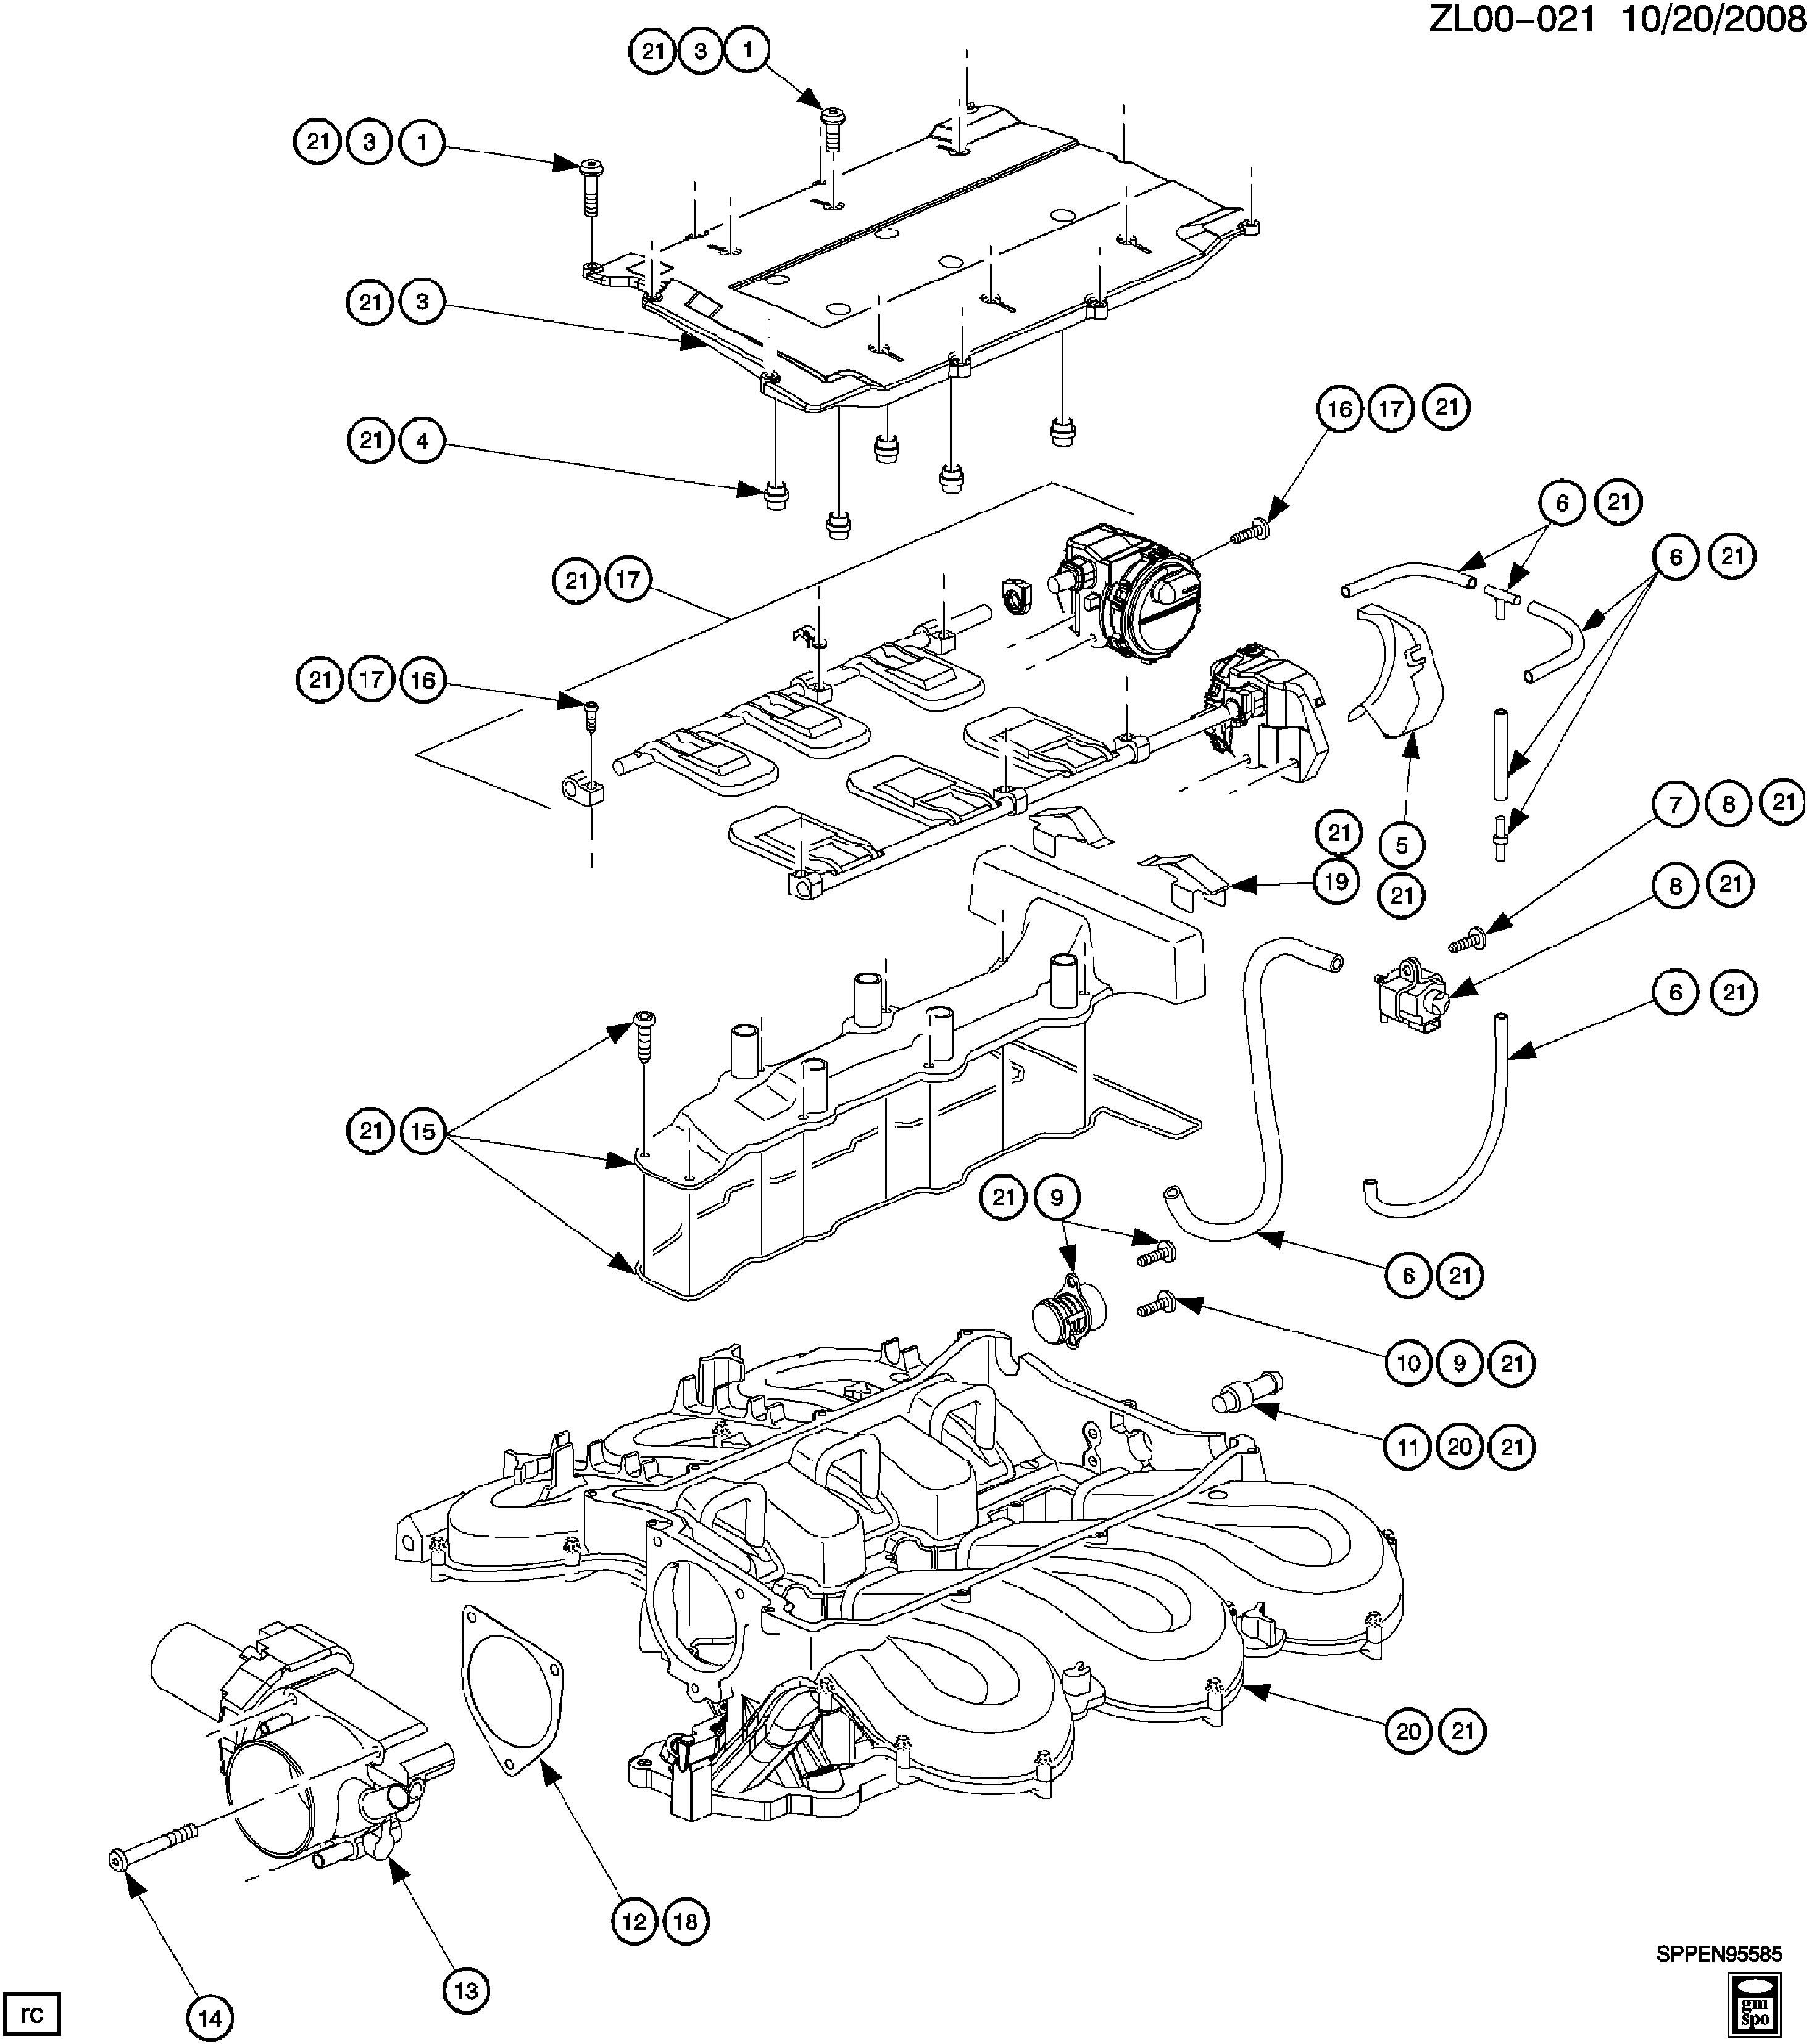 L81 Engine Diagram Manual E Books Saturn Vue Wiring L Asm 3 0l V6 Intake Manifold U0026 Throttle Bodyl